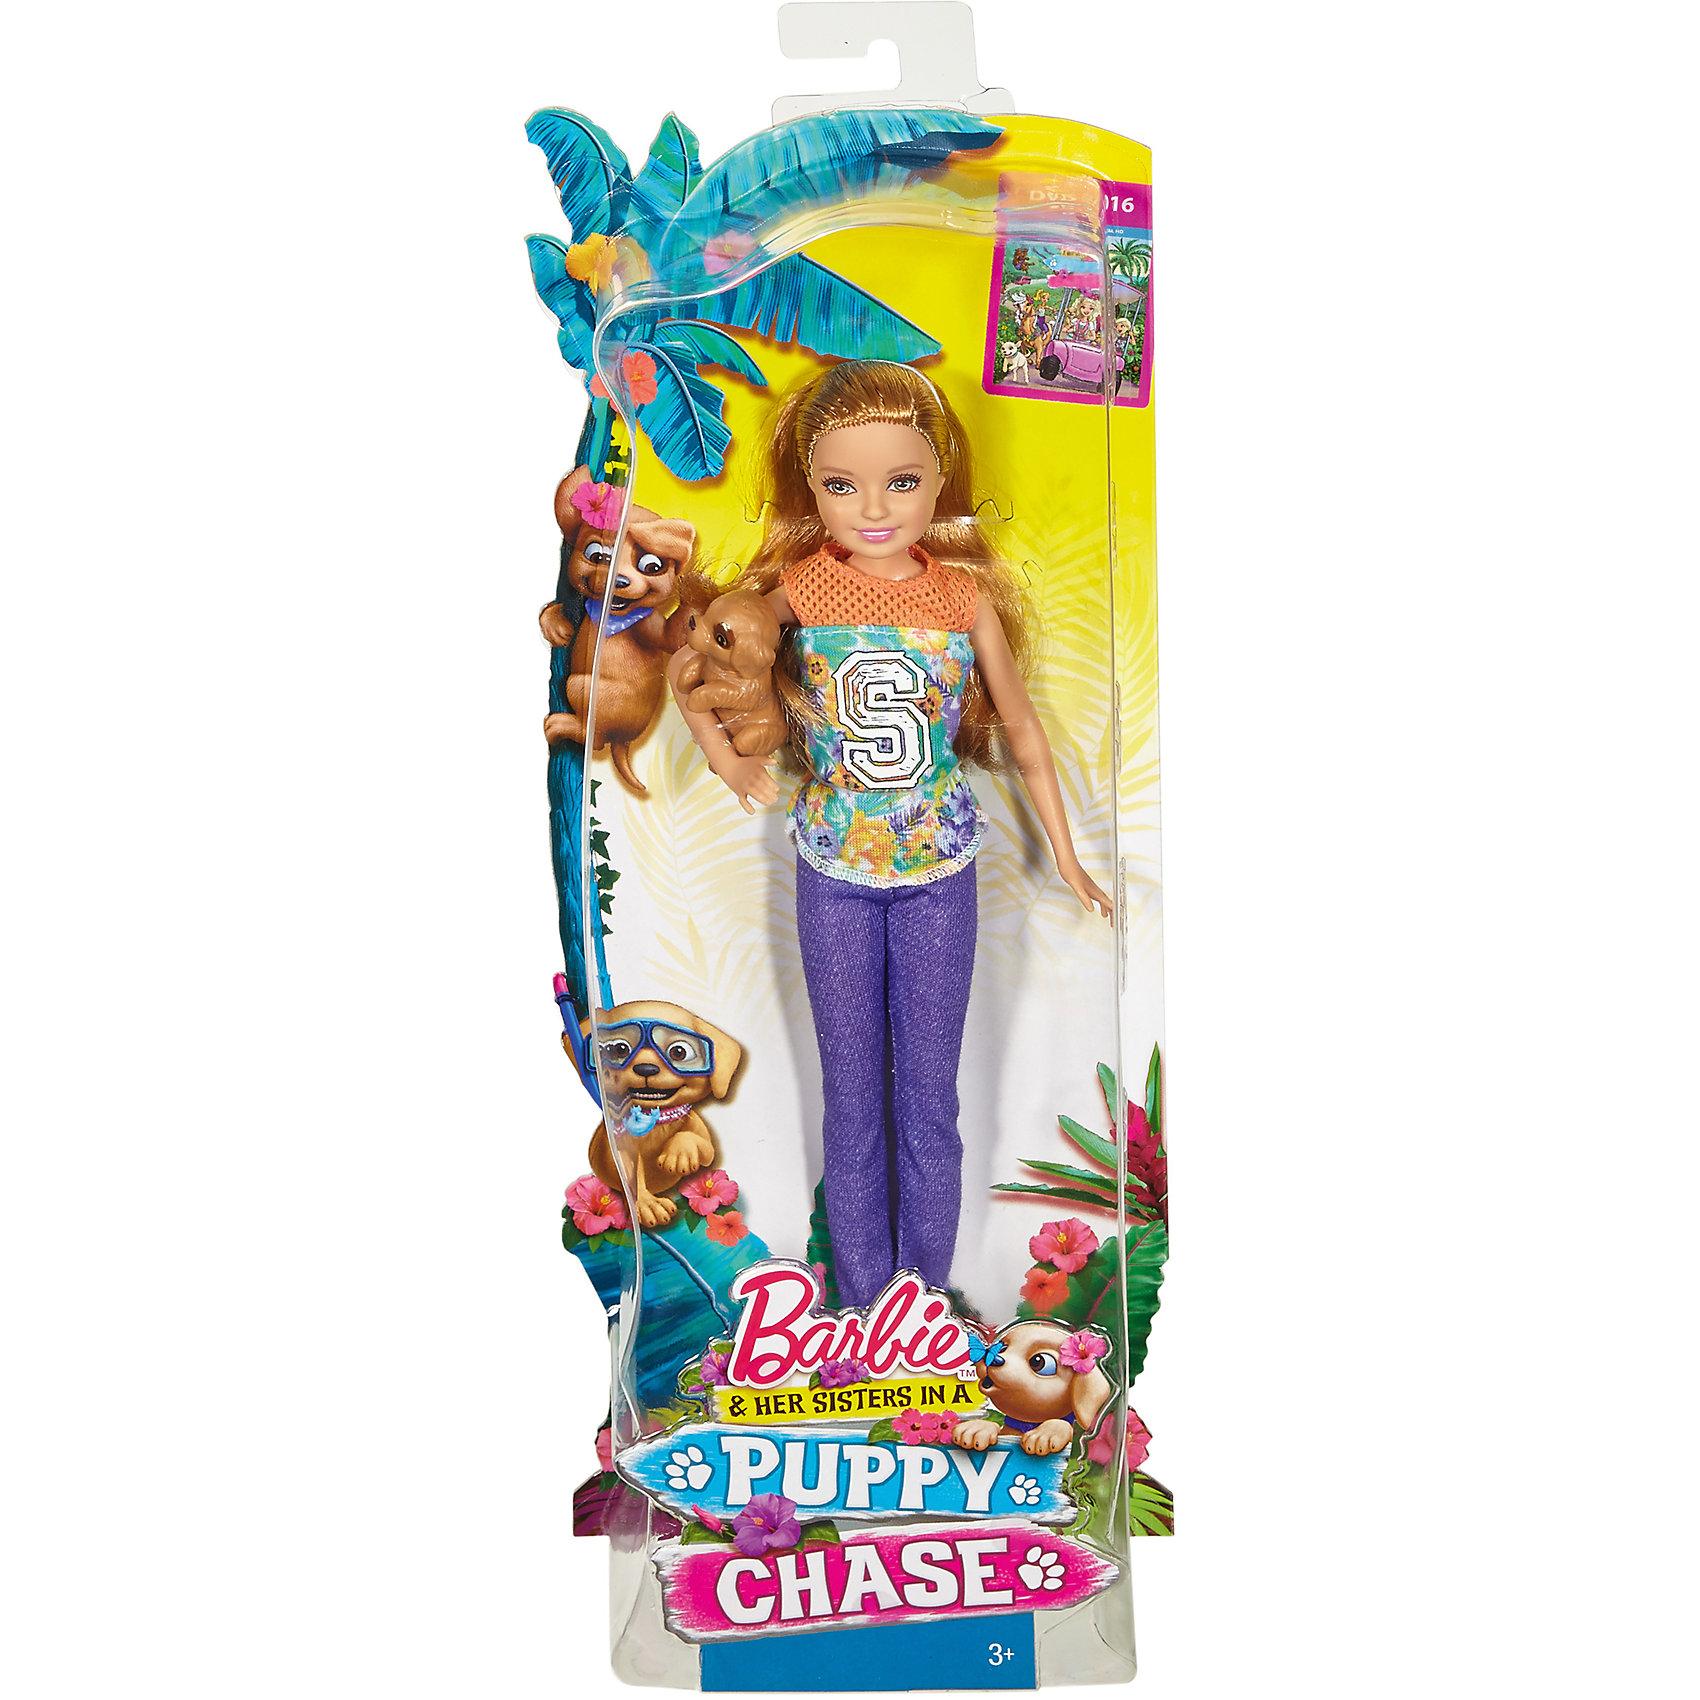 Кукла-сестра Barbie со щенками, BarbieBarbie<br><br><br>Ширина мм: 328<br>Глубина мм: 129<br>Высота мм: 53<br>Вес г: 189<br>Возраст от месяцев: 36<br>Возраст до месяцев: 72<br>Пол: Женский<br>Возраст: Детский<br>SKU: 5440247